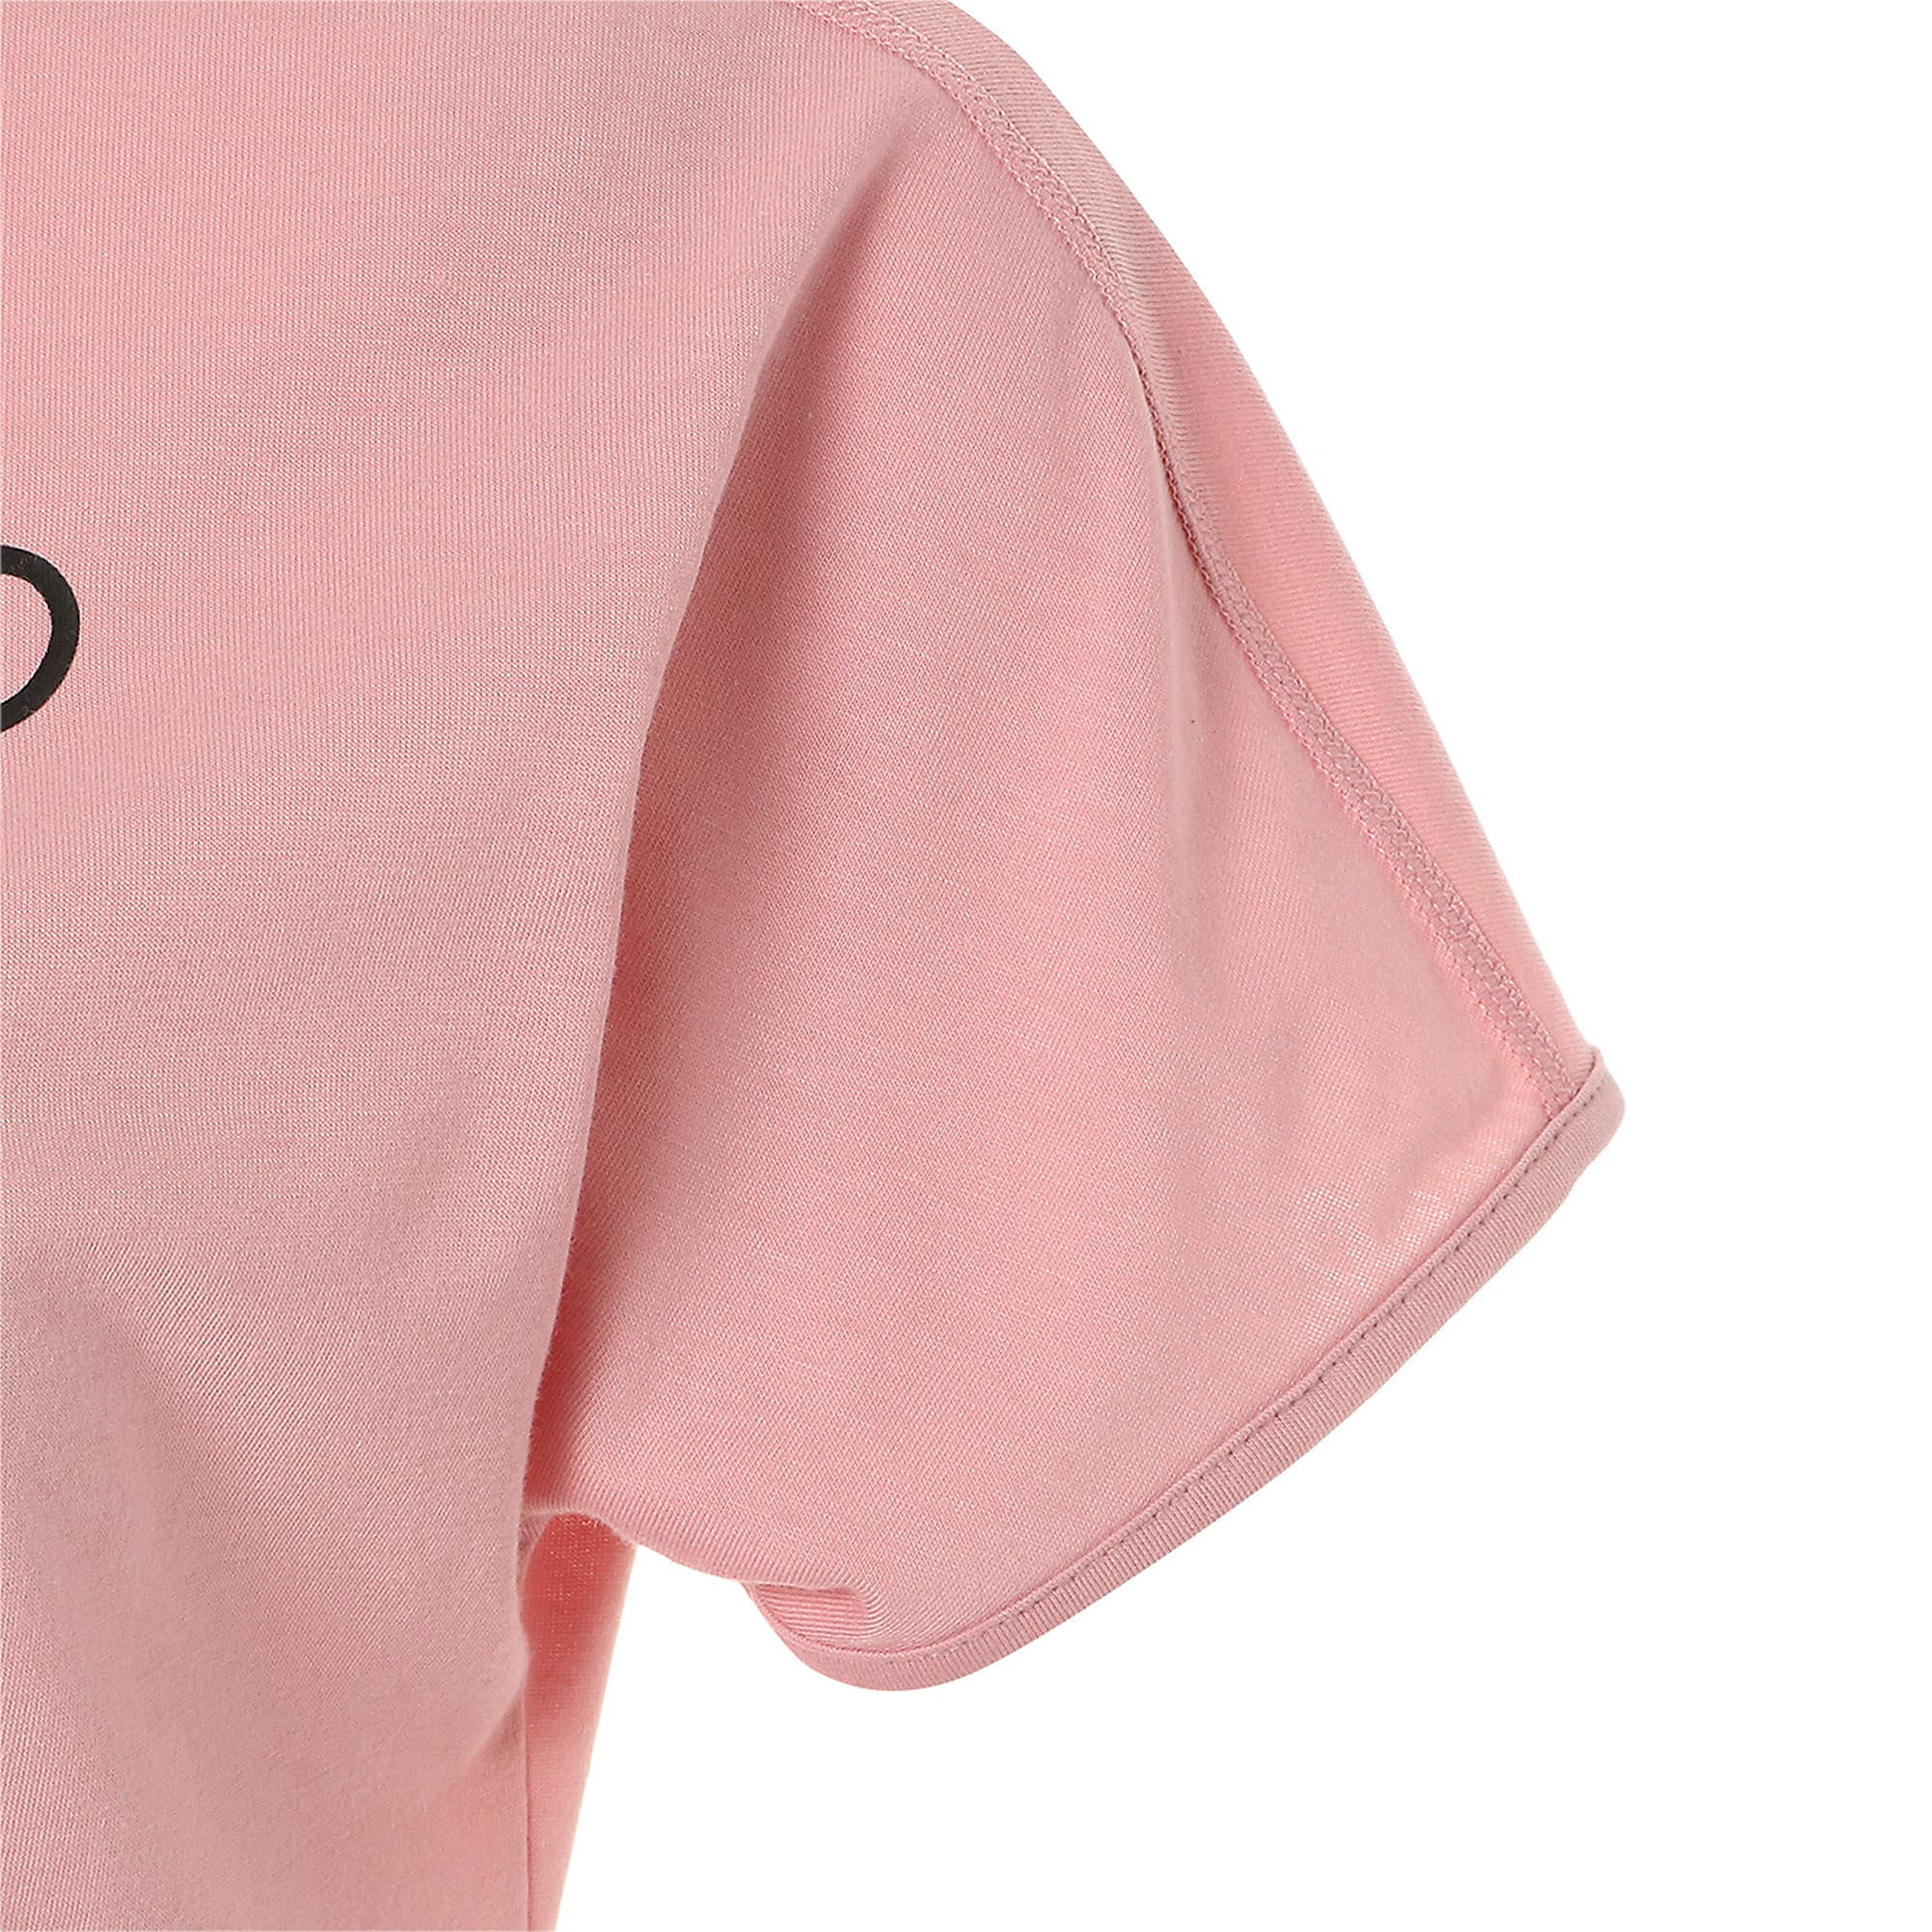 Thumbnail 8 of FAVORITE キャット SS ウィメンズ トレーニング Tシャツ 半袖, Bridal Rose, medium-JPN